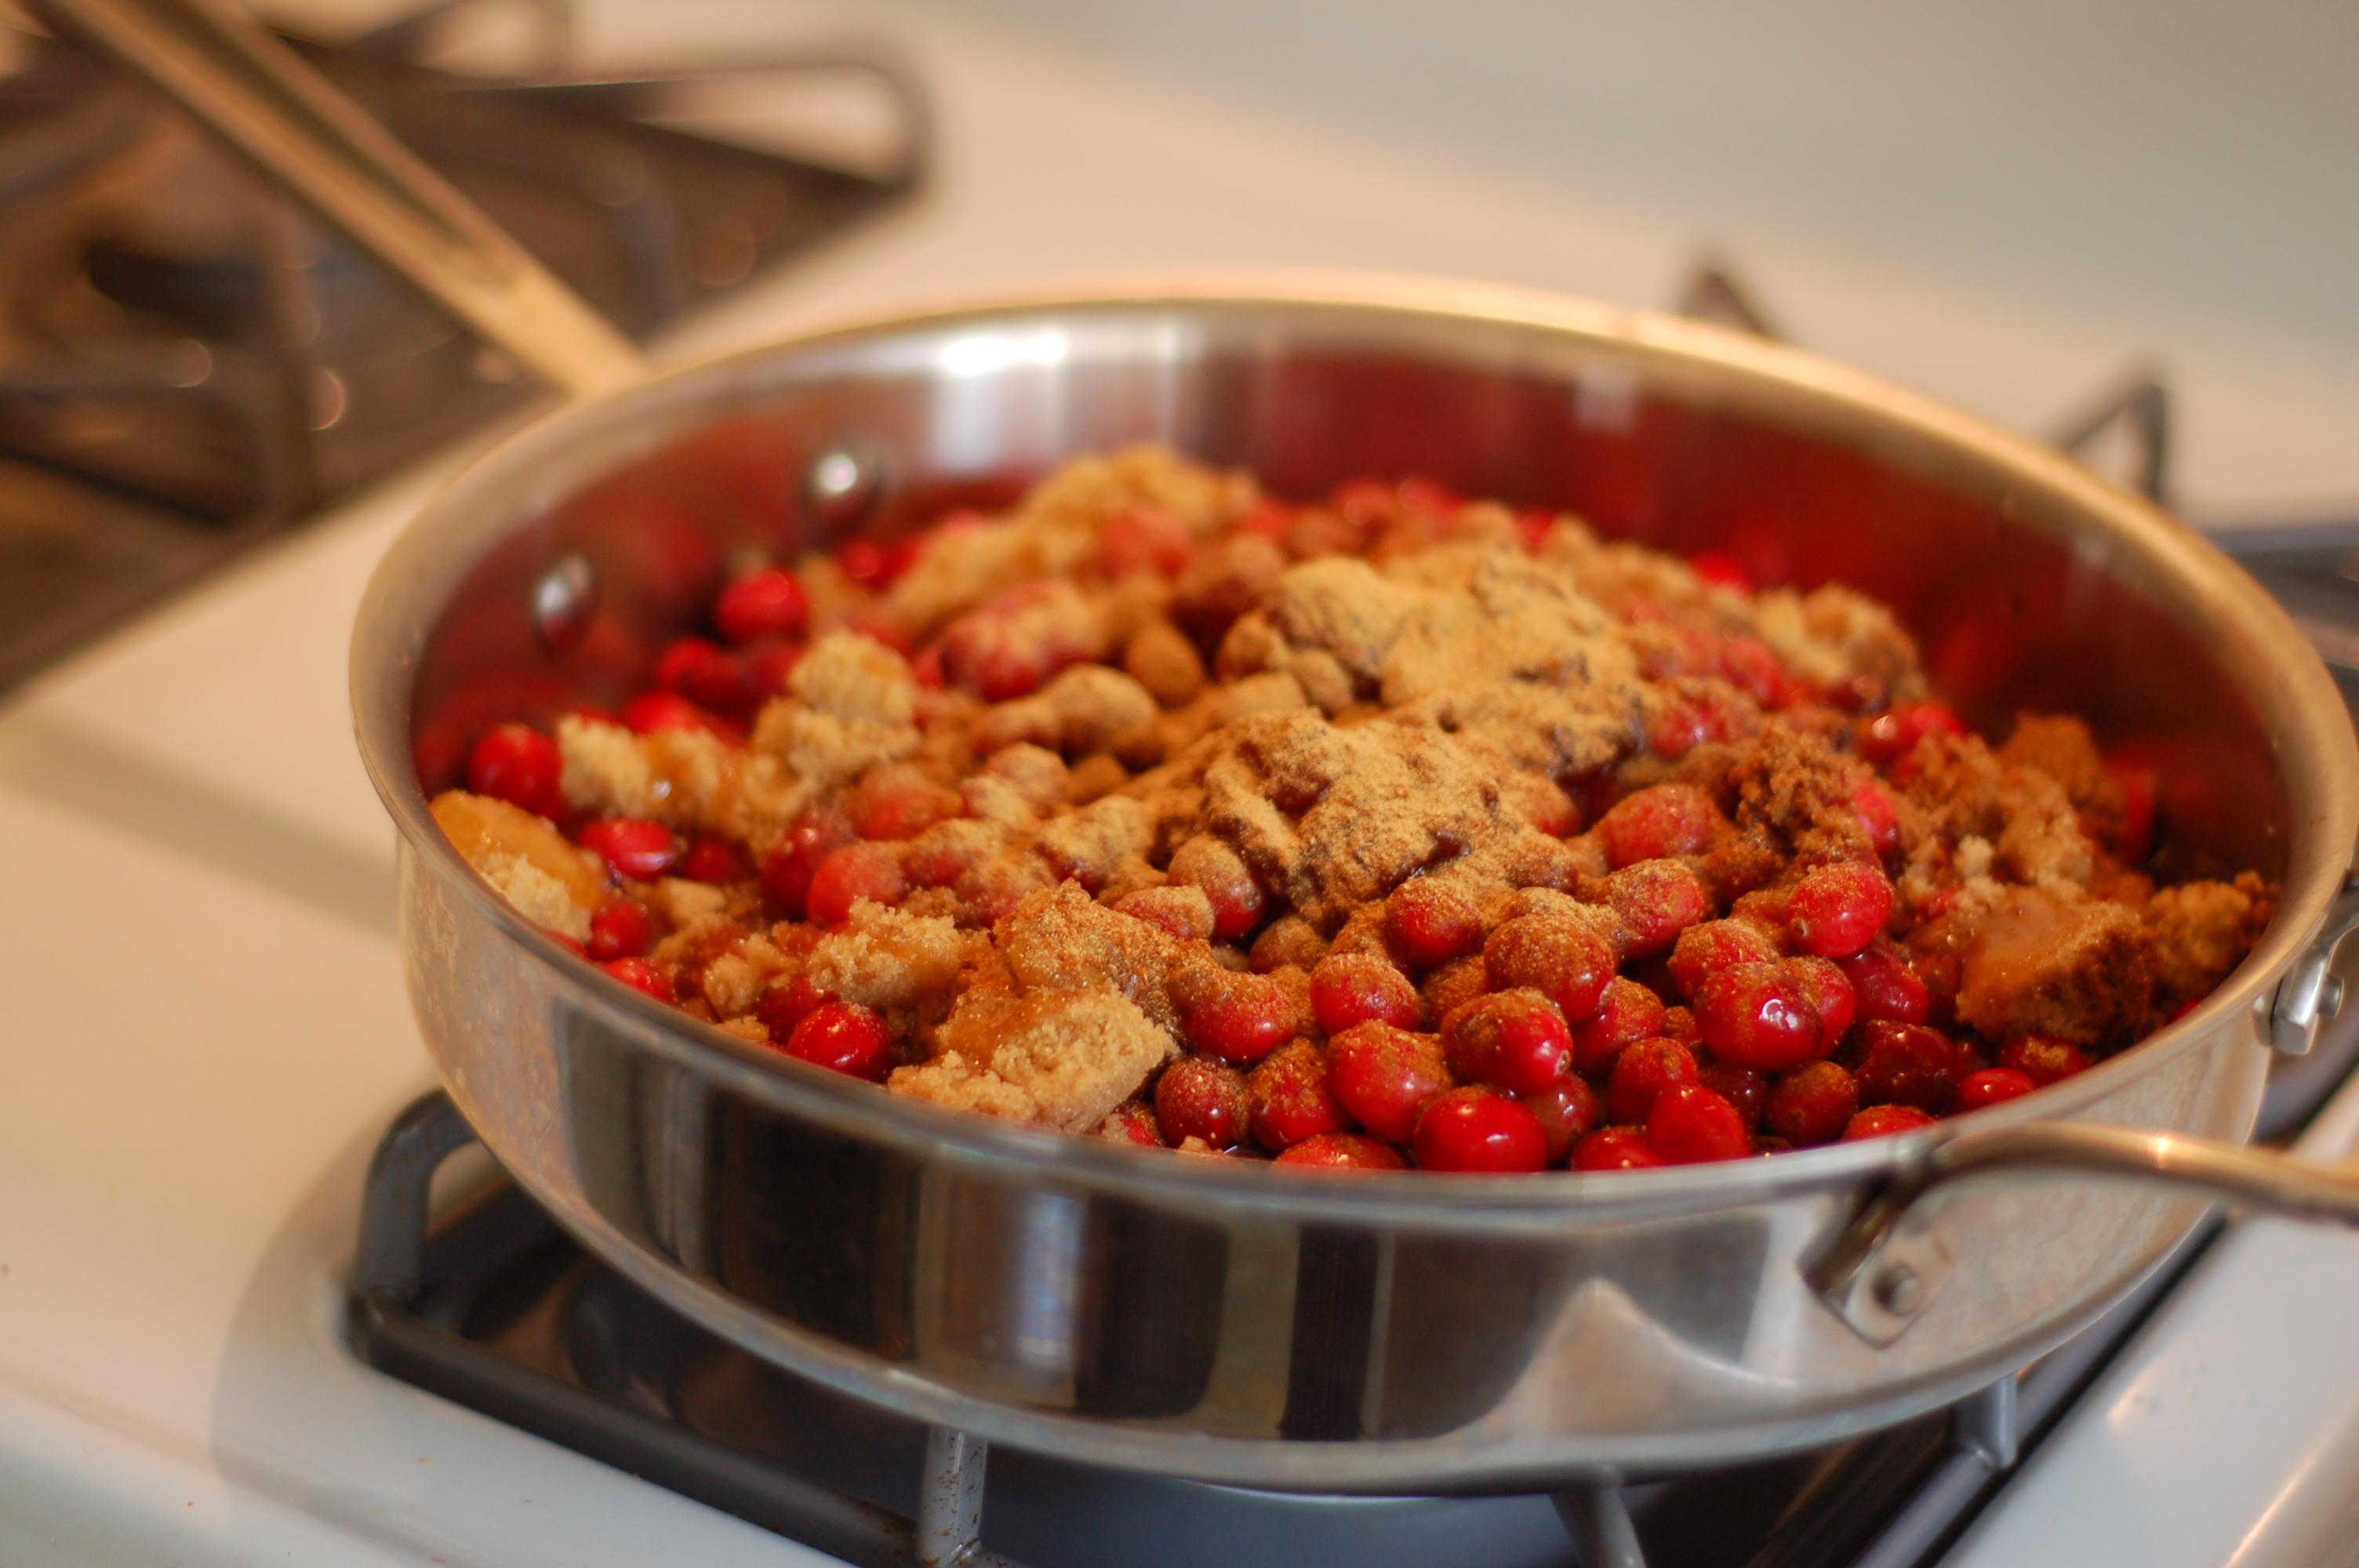 LB's Good Spoon Cranberry Sauce